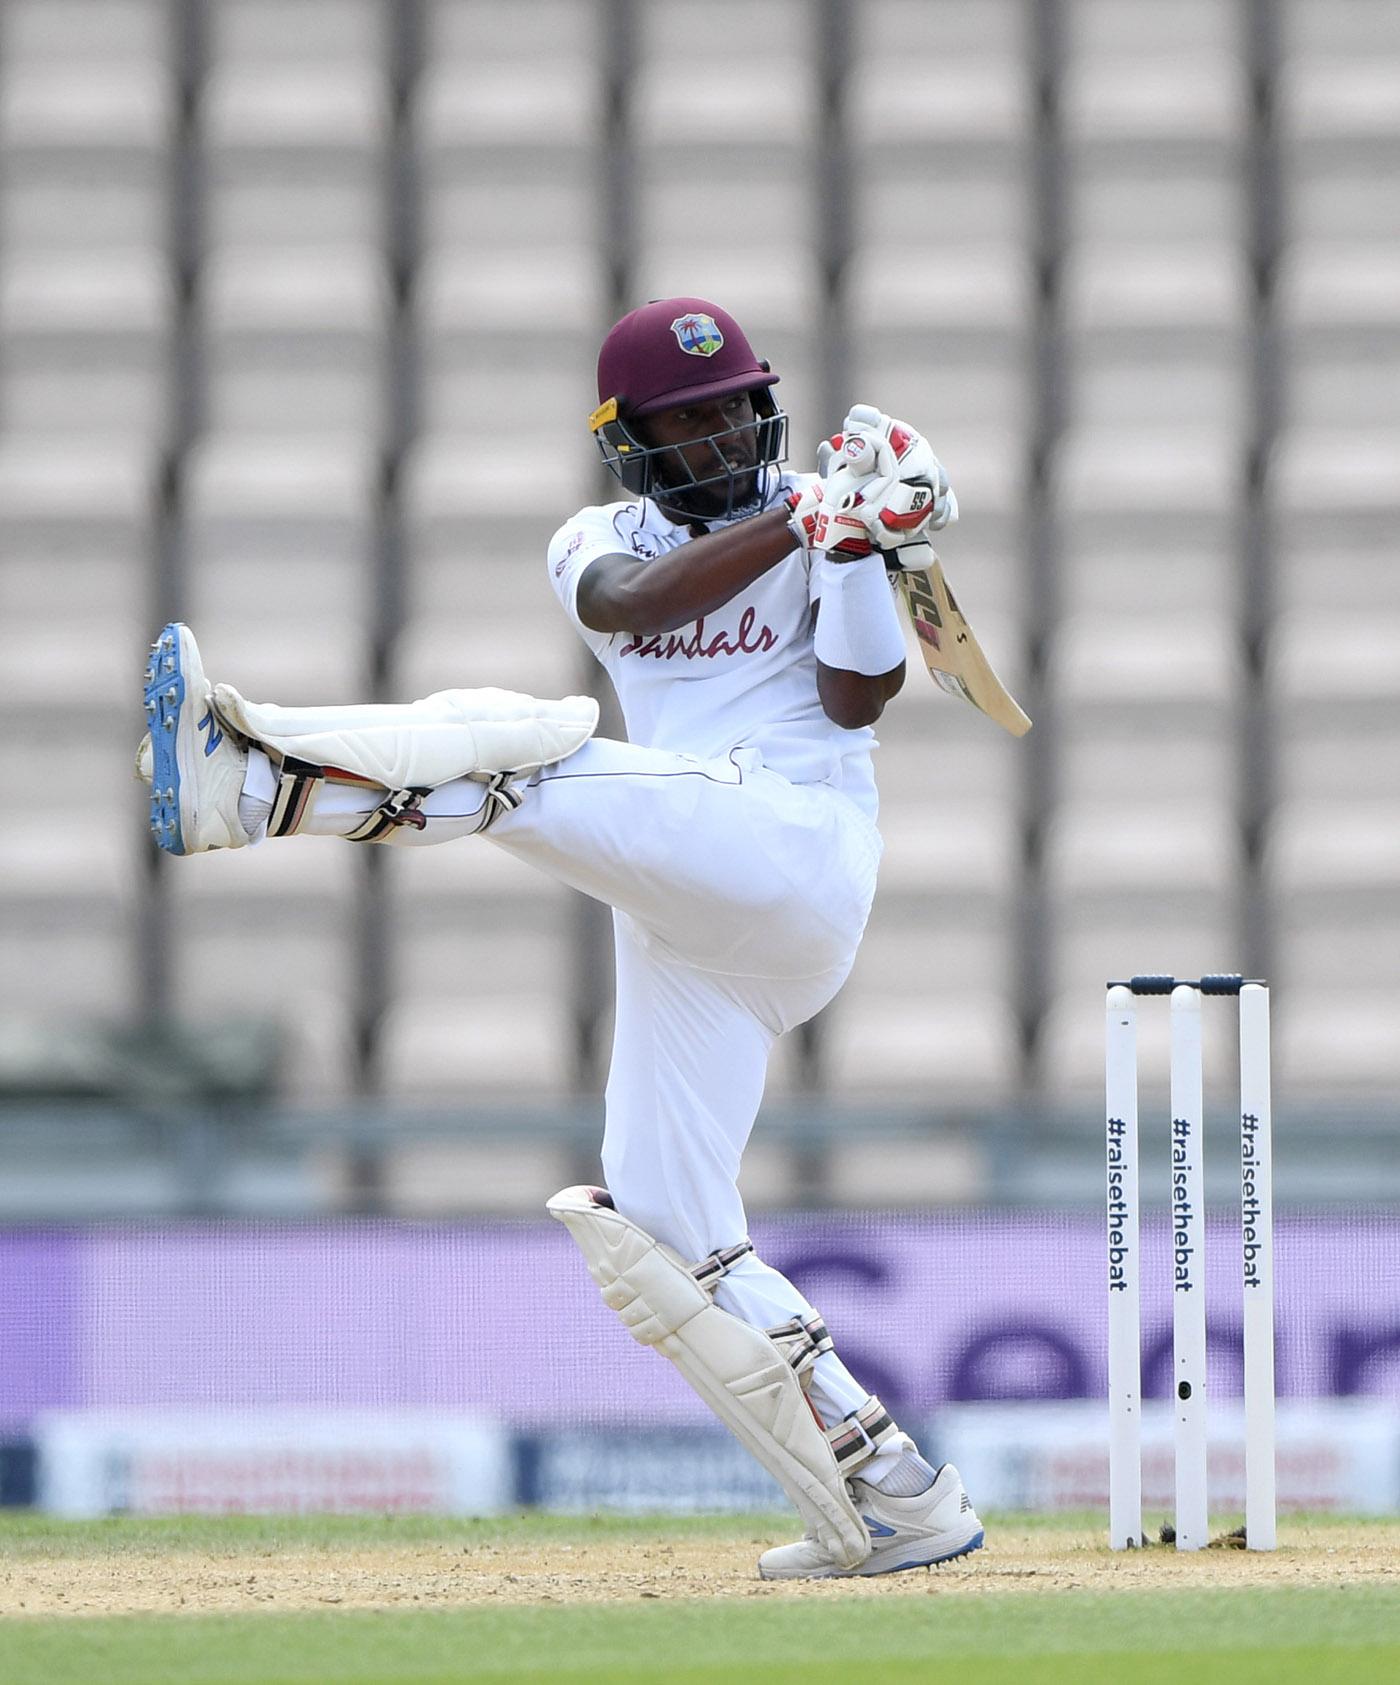 Jermaine Blackwood stars as West Indies beat England in Southampton